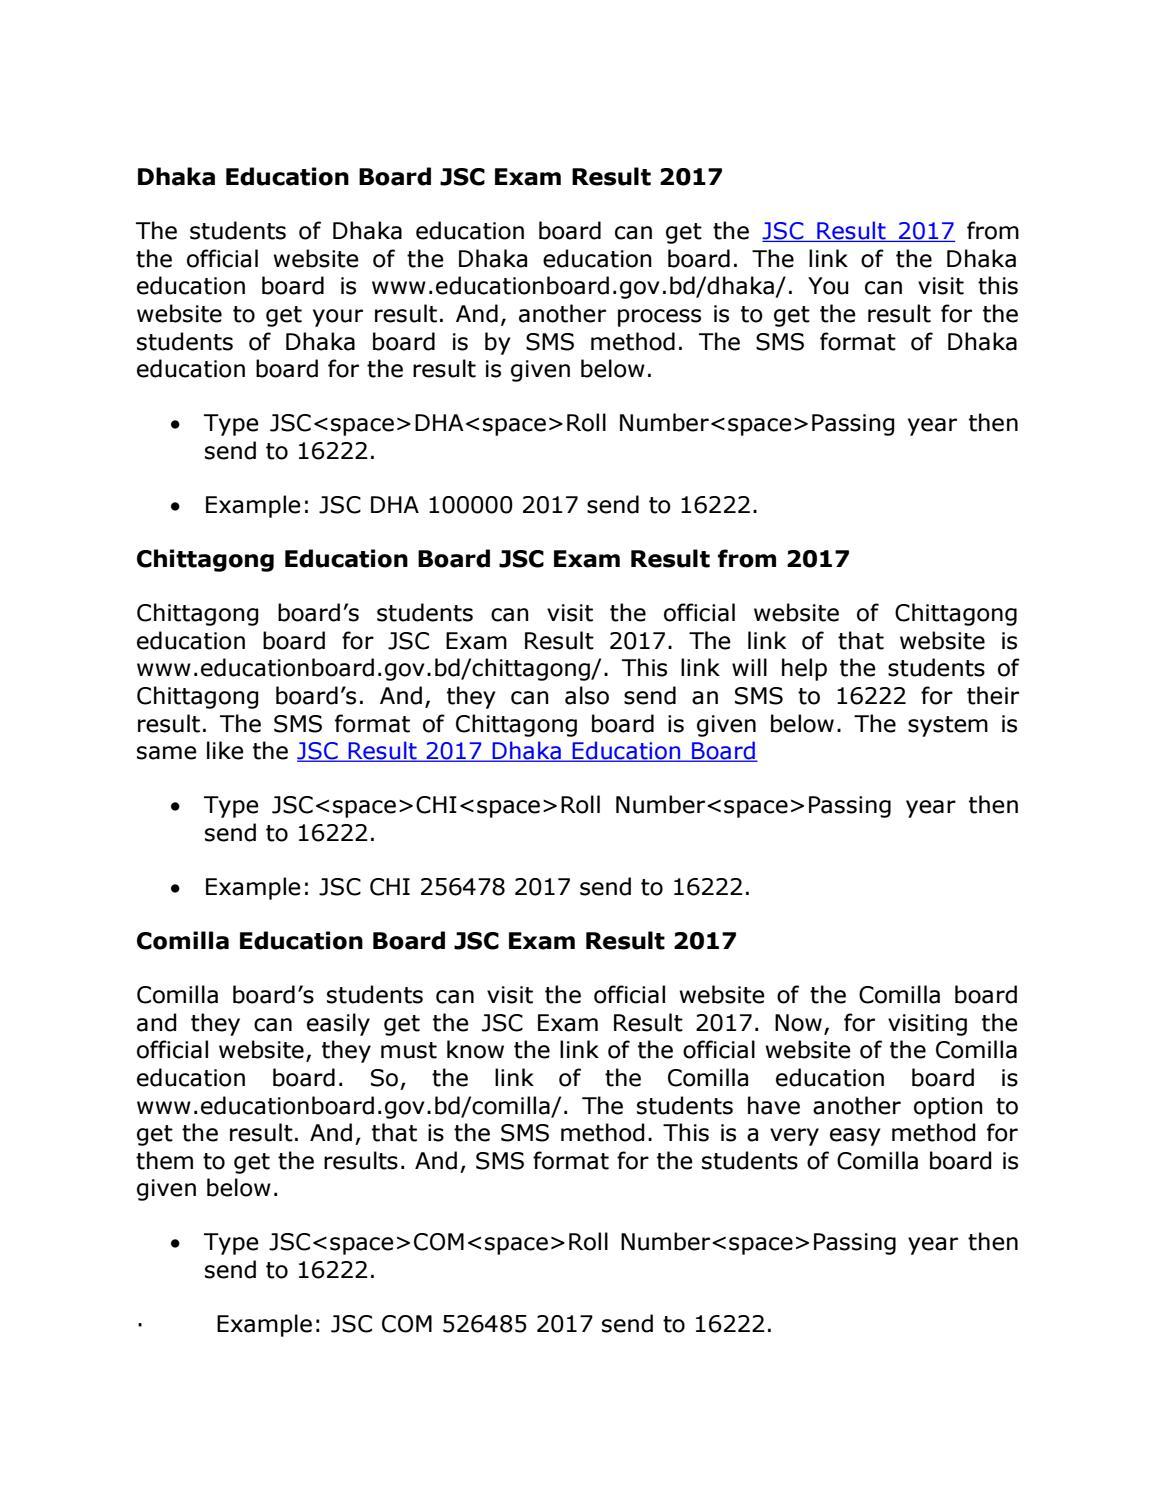 JSC Result 2017 Publish Date by JSC Result 2017 - issuu